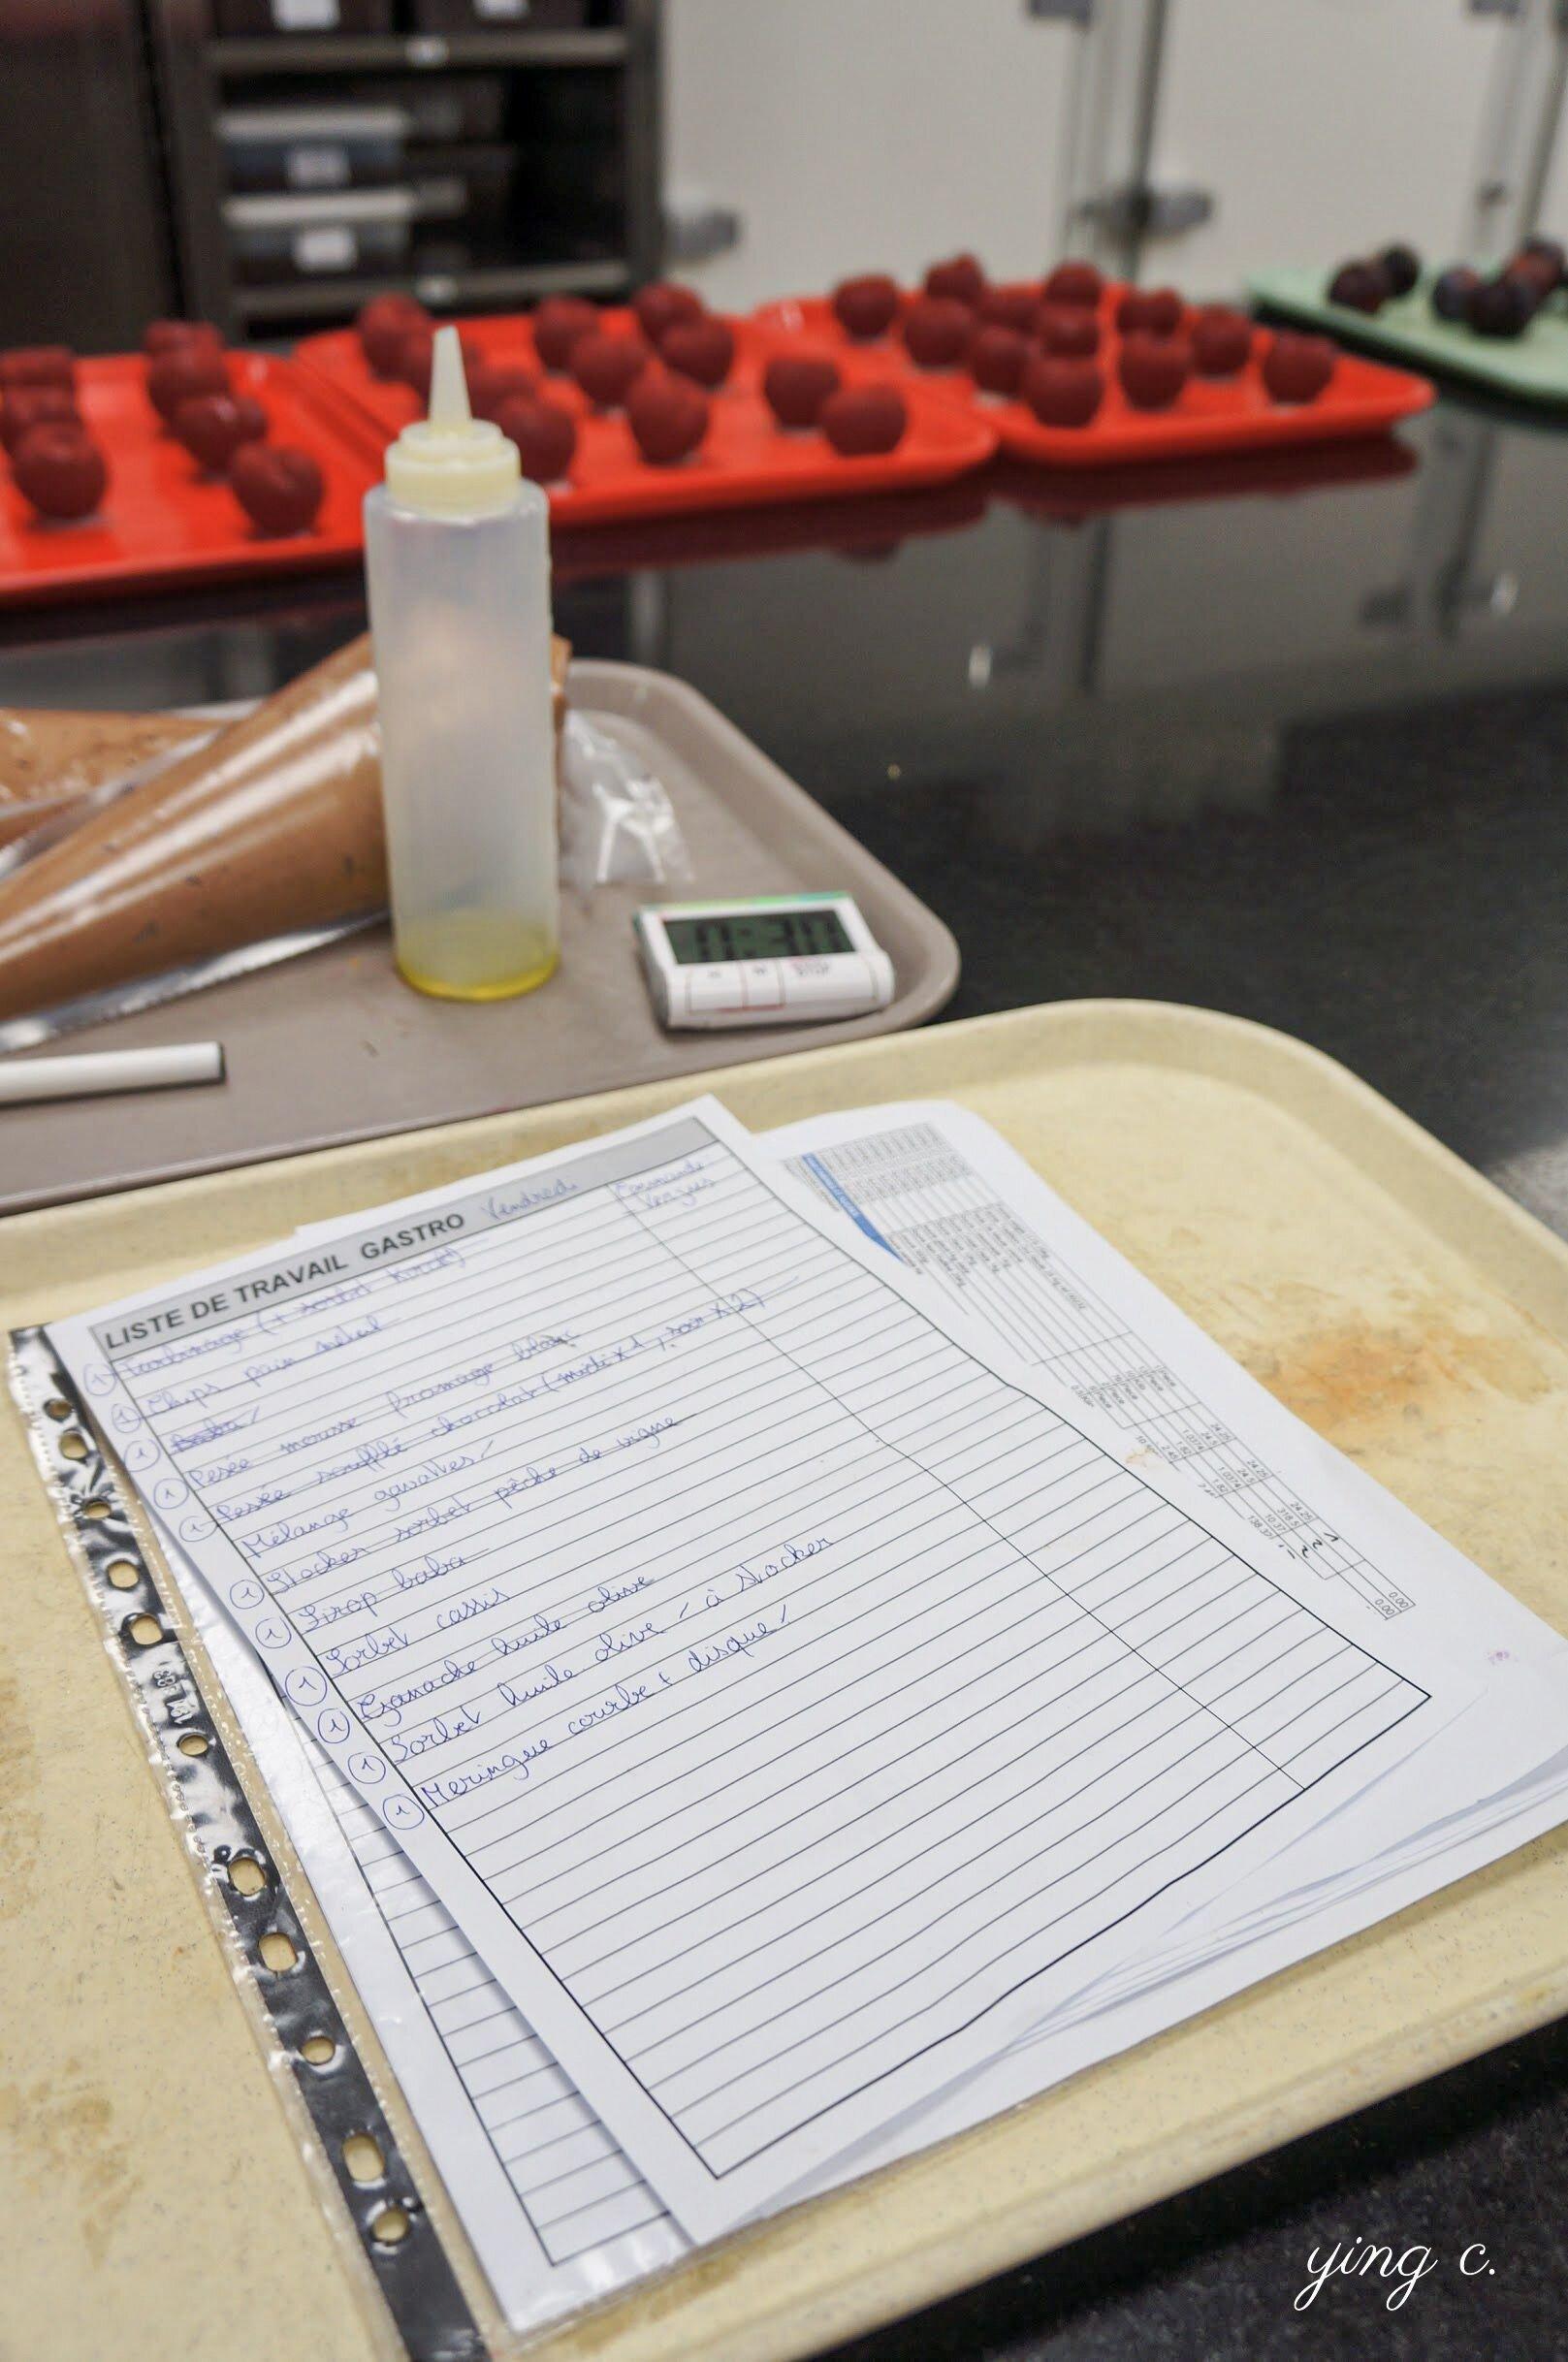 Le Meurice 甜點廚房中,會由小組長與副小組長記下每天需要完成的工作任務、並確保一一完成。照片中便是「gastro」小組當日的工作清單。